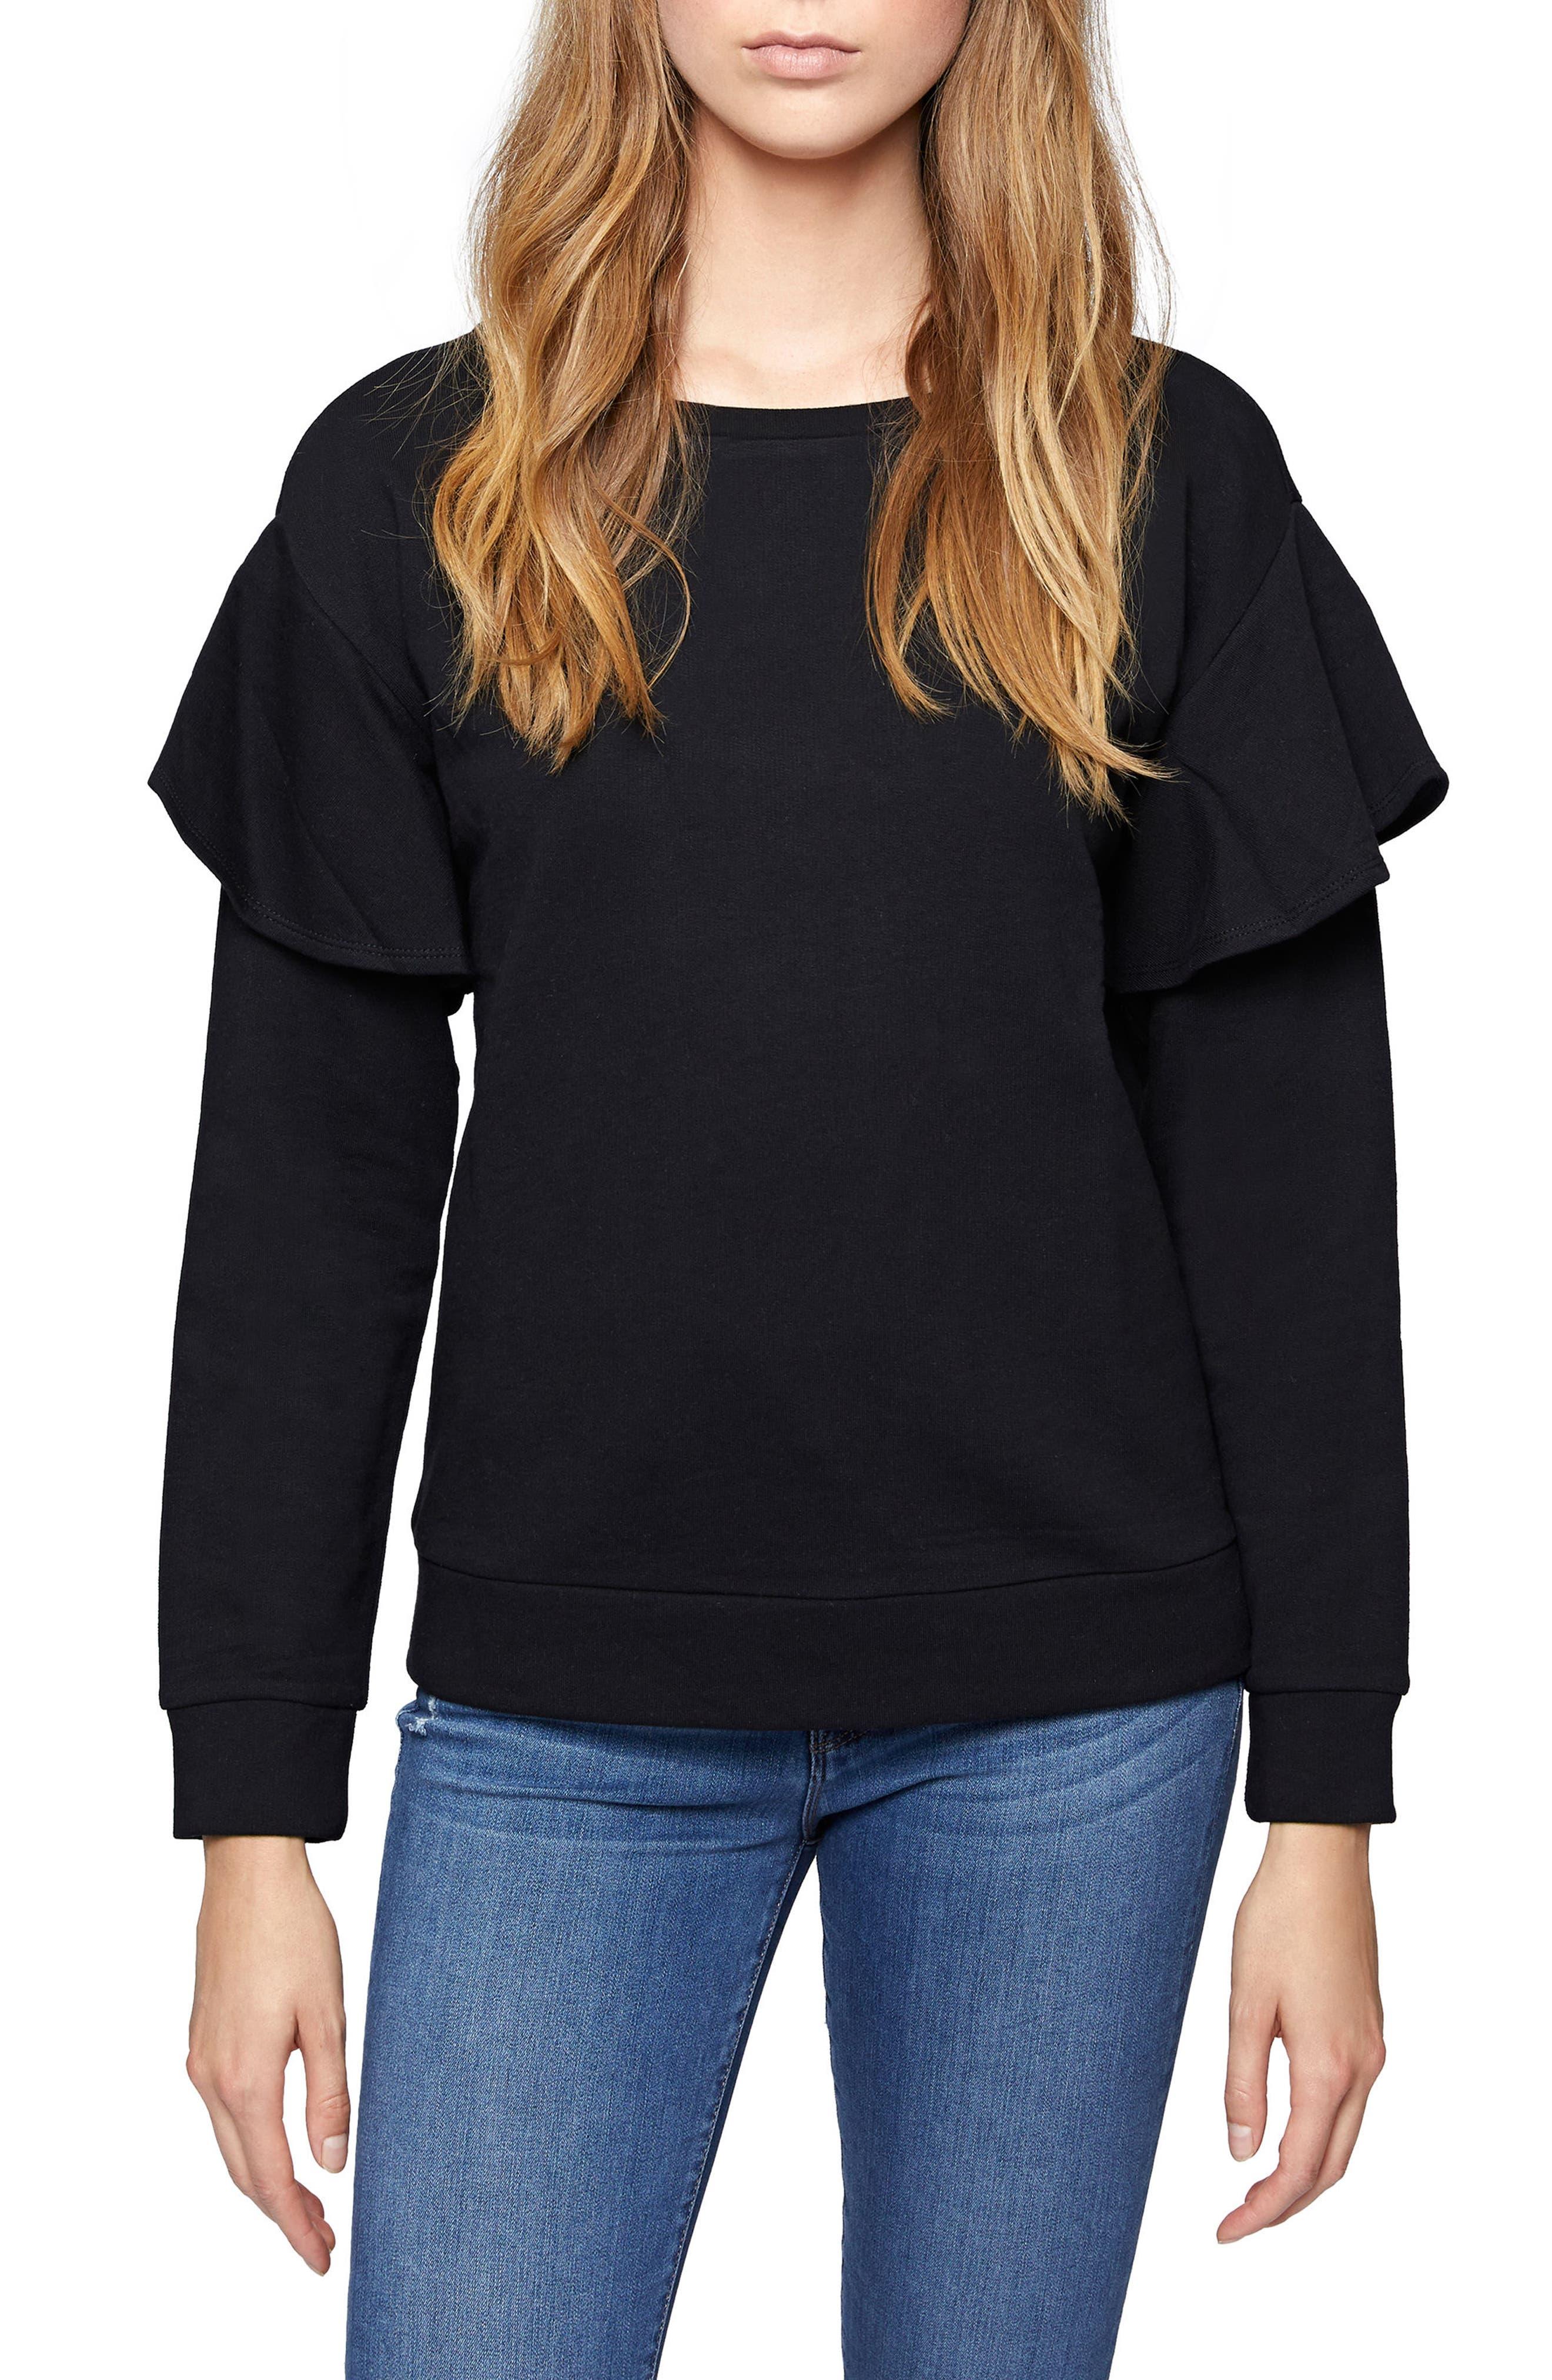 Dominique Sweatshirt,                         Main,                         color, 001